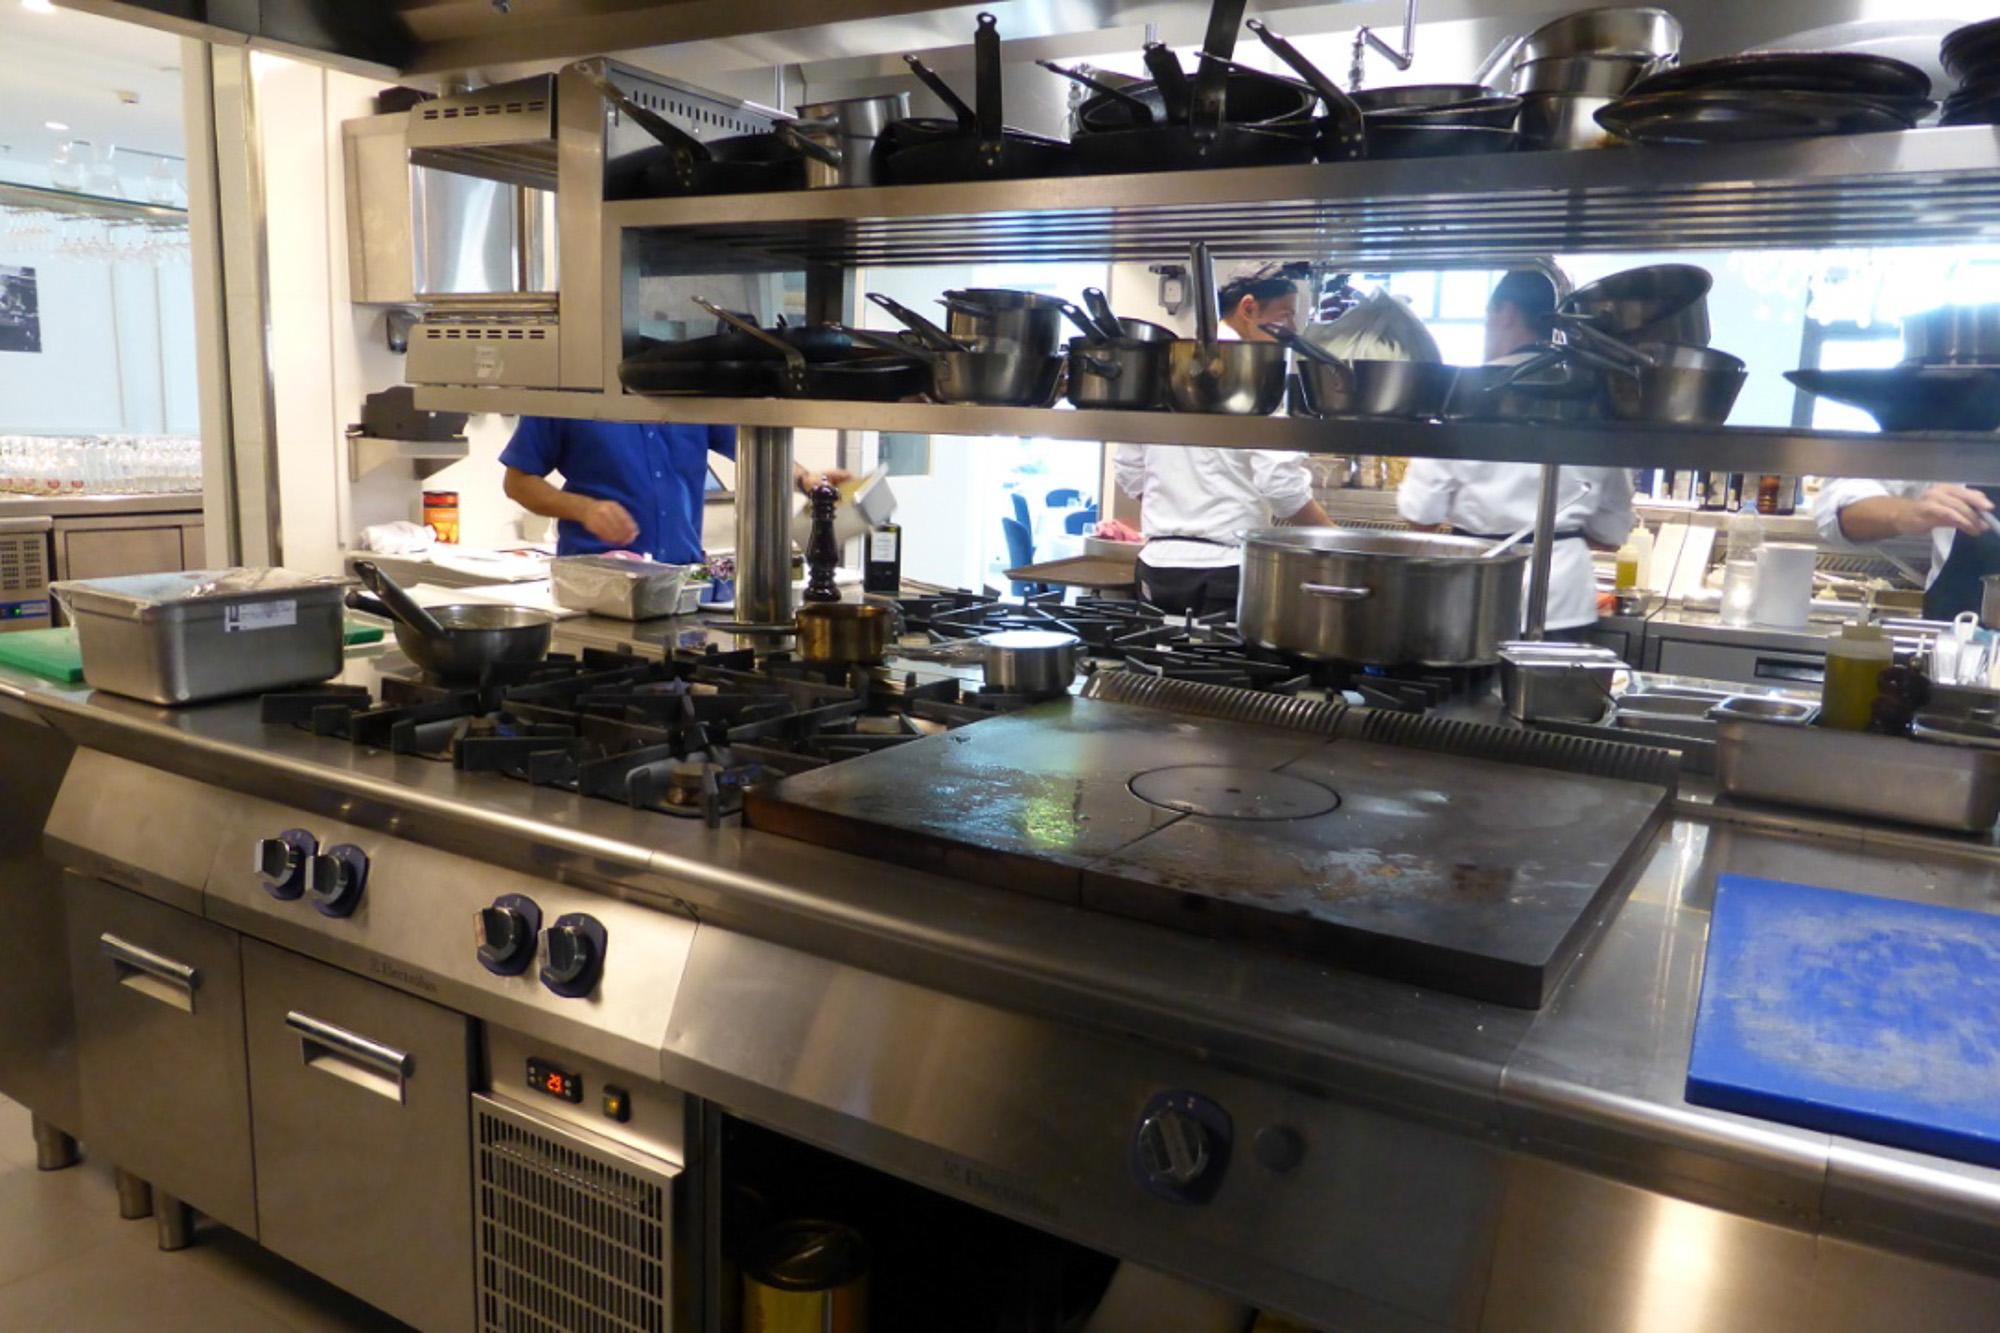 Italia_kitchen_-Bice_d-3